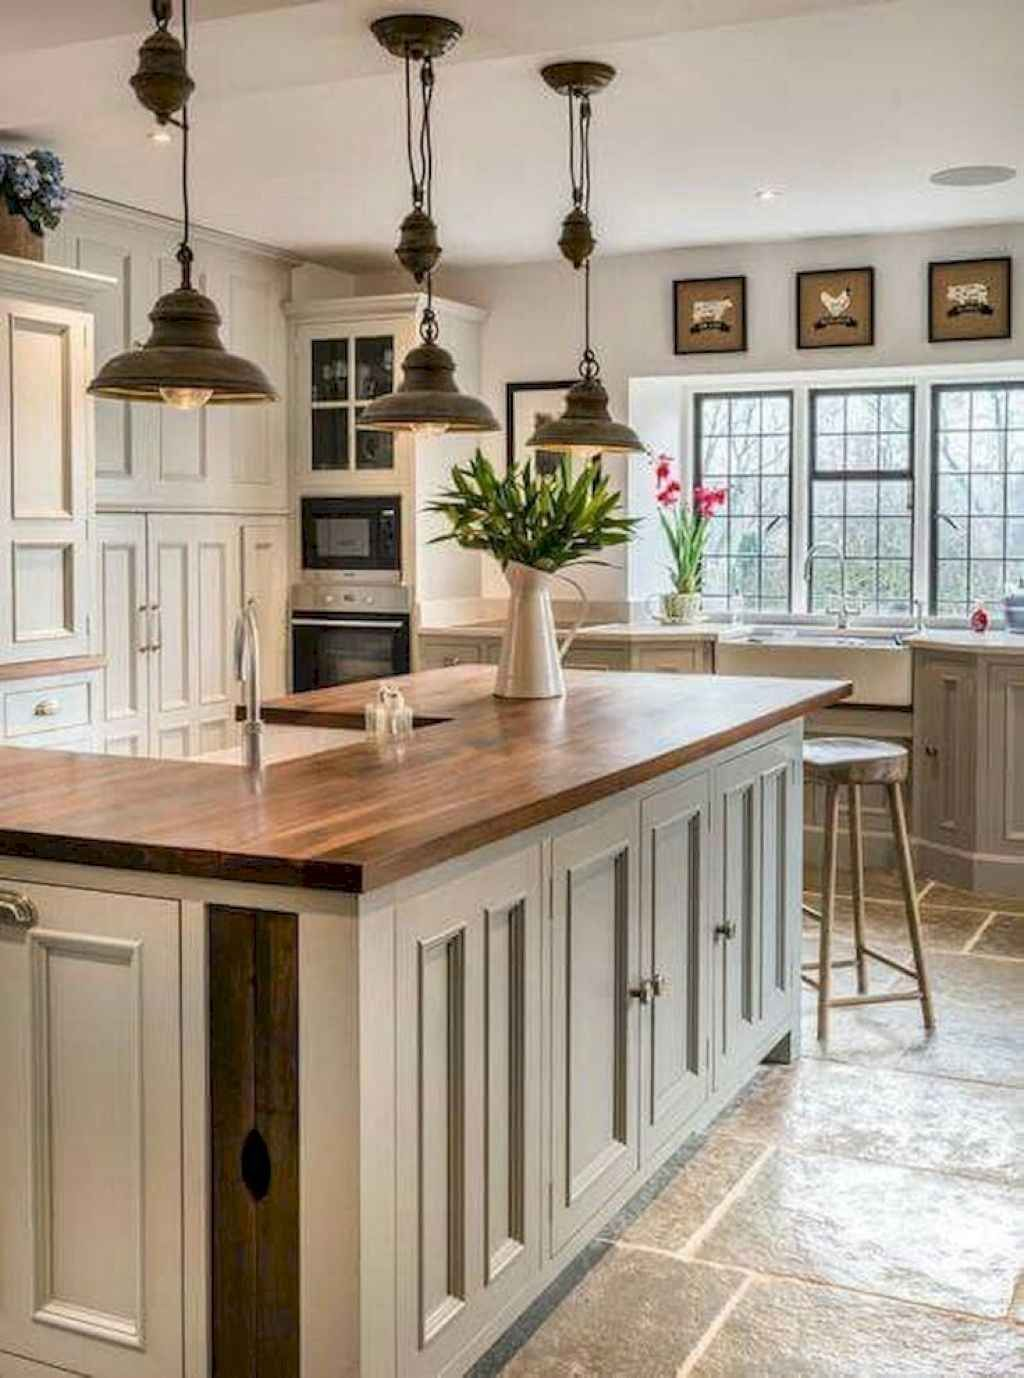 Gorgeous 35 Rustic Farmhouse Kitchen Cabinets Ideas Source Link Https Decornamentati Rustic Modern Kitchen Country Kitchen Lighting Rustic Kitchen Cabinets,Chocolate Brown Mocha Loreal Hair Color